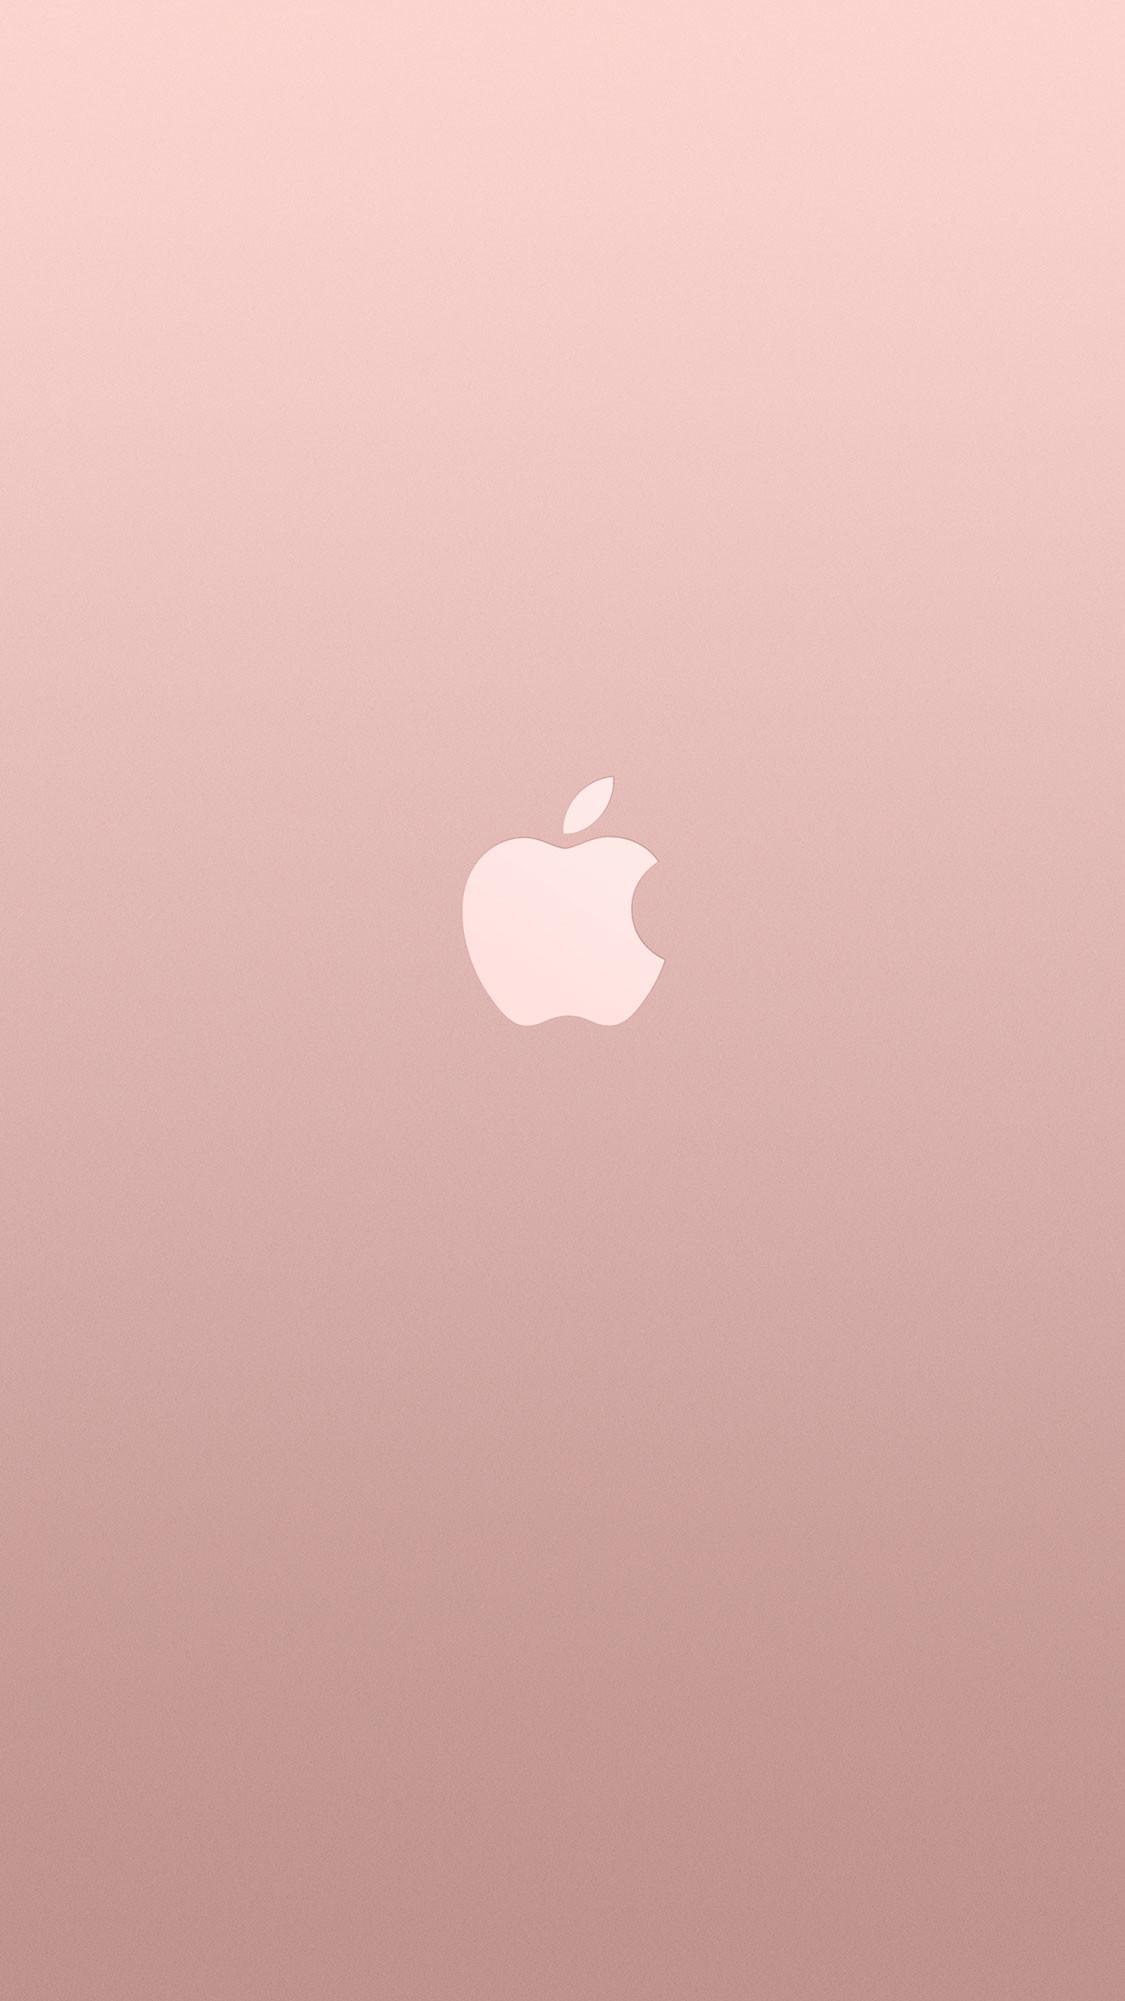 … Rose-Gold-Apple-iPhone-6s-wallpaper-HD …